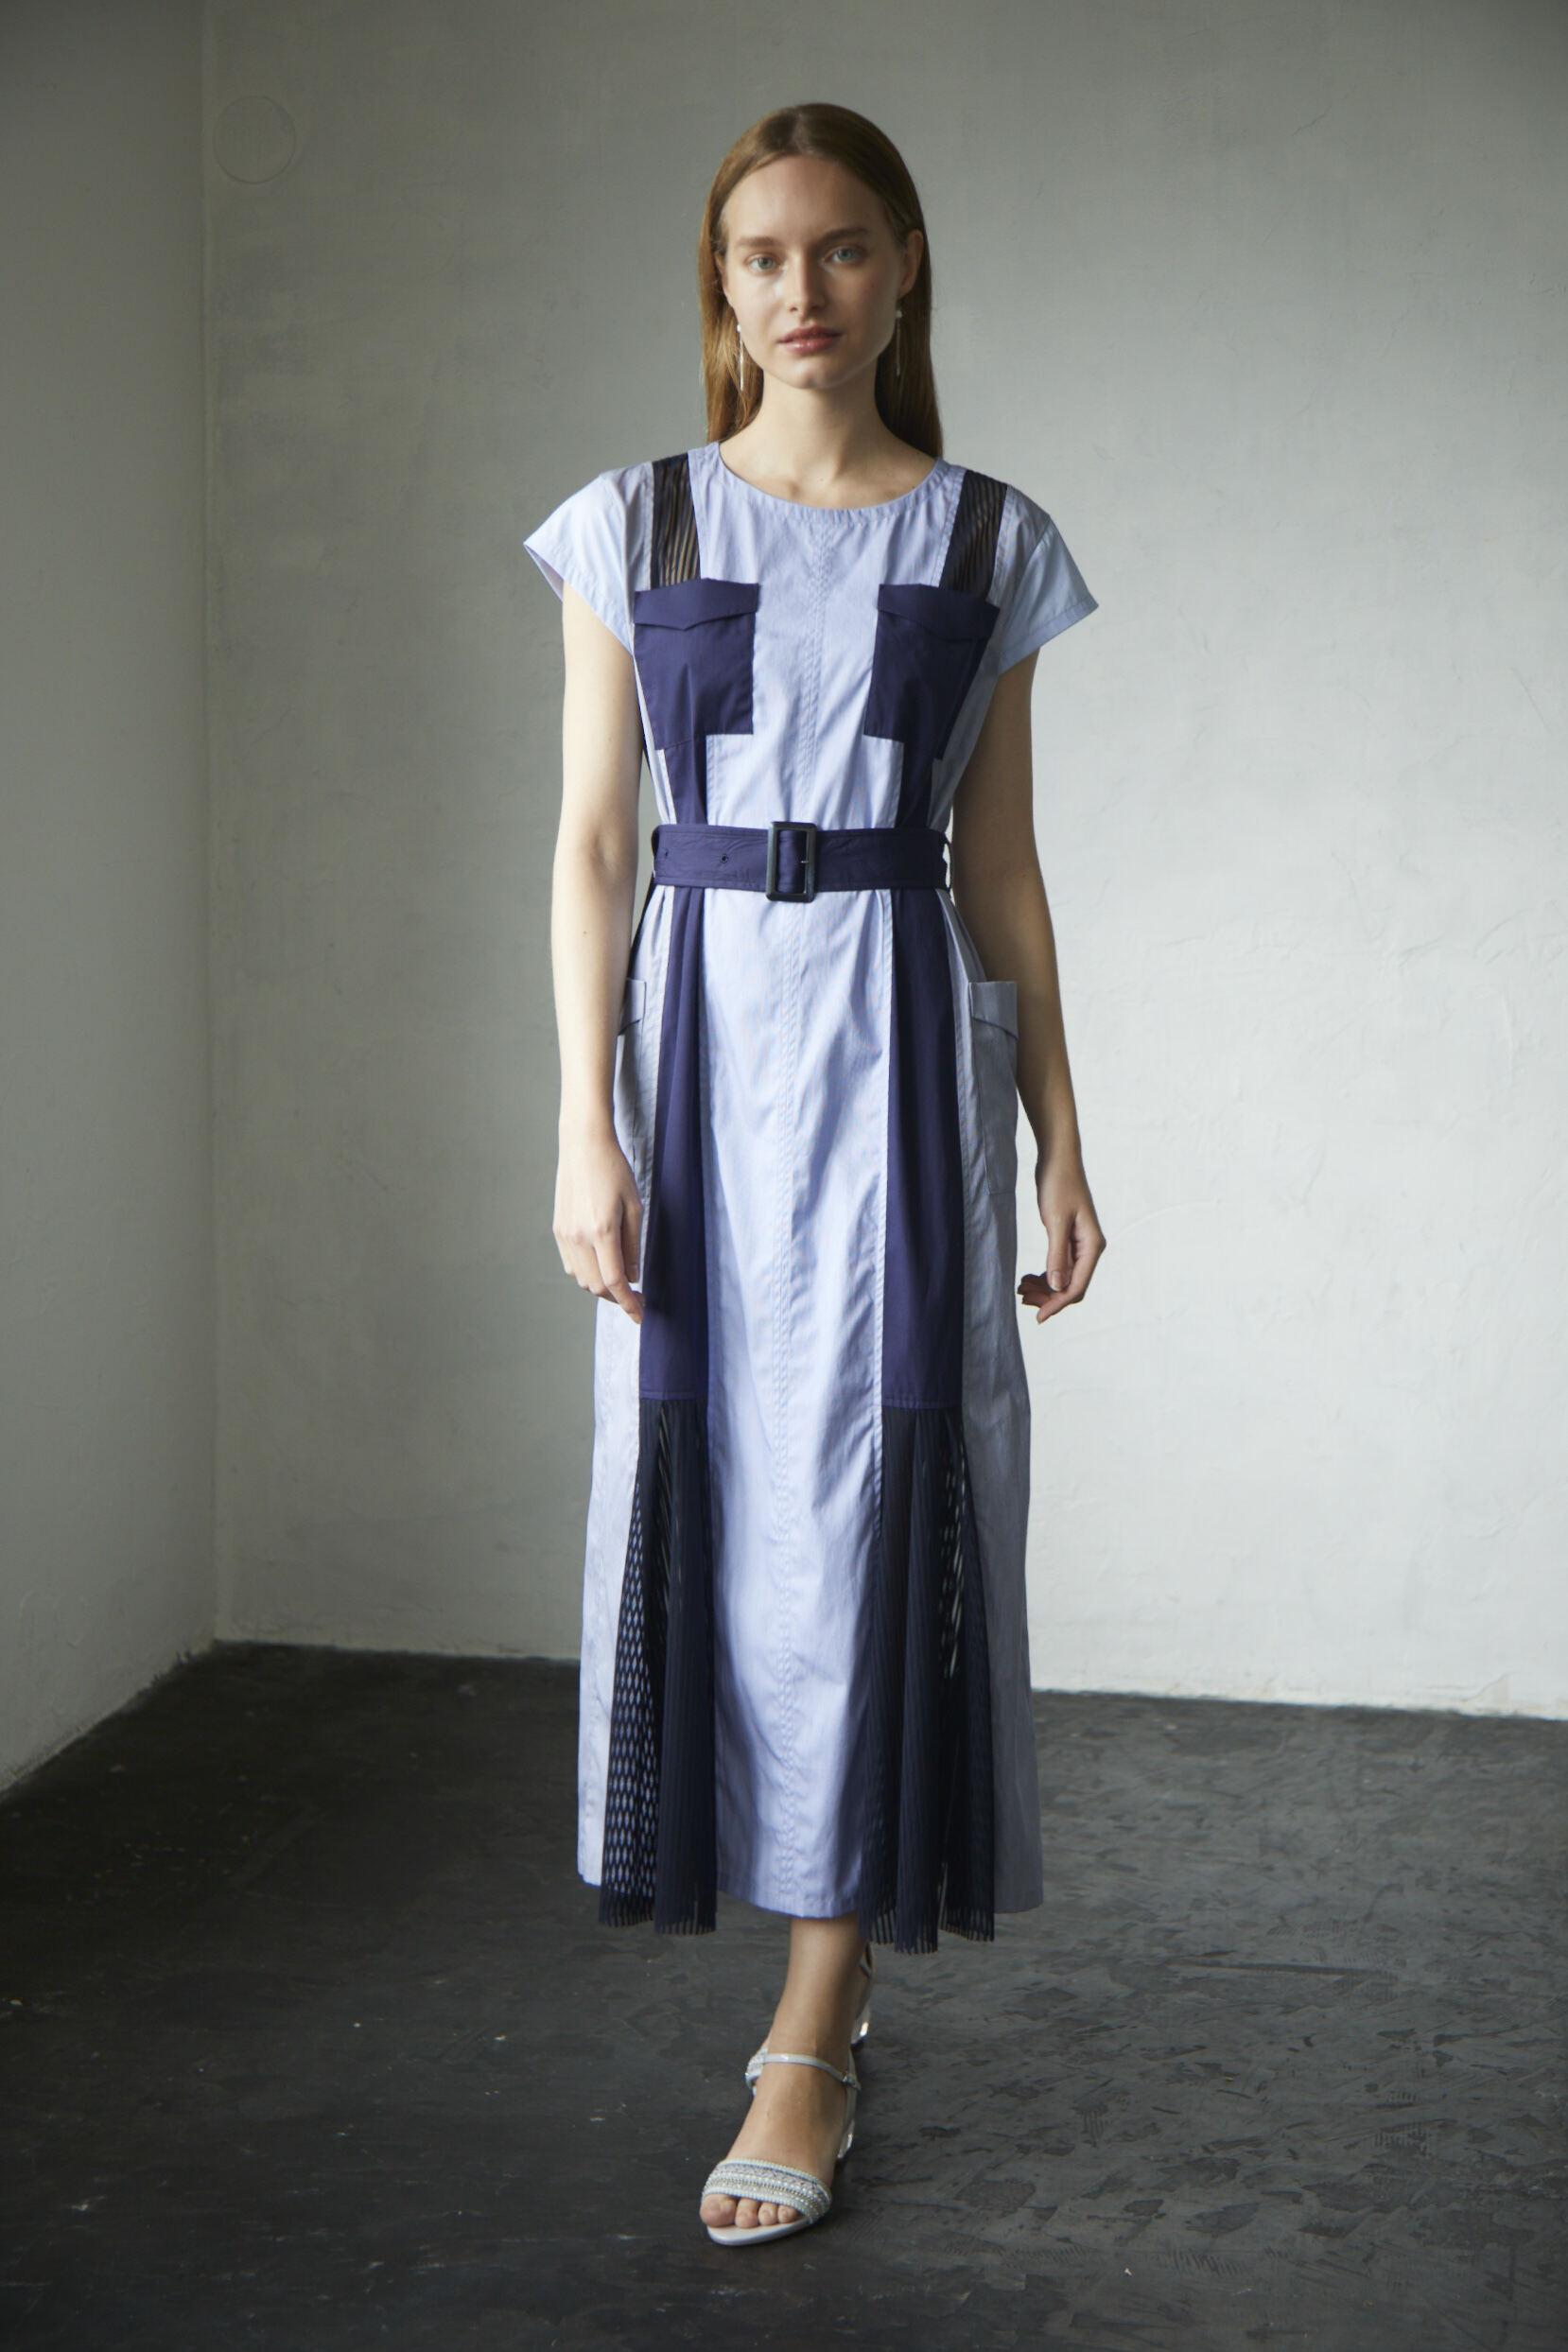 【2021SS先行受注アイテム】TYPEWRITER COMPLEX SAFARI DRESS